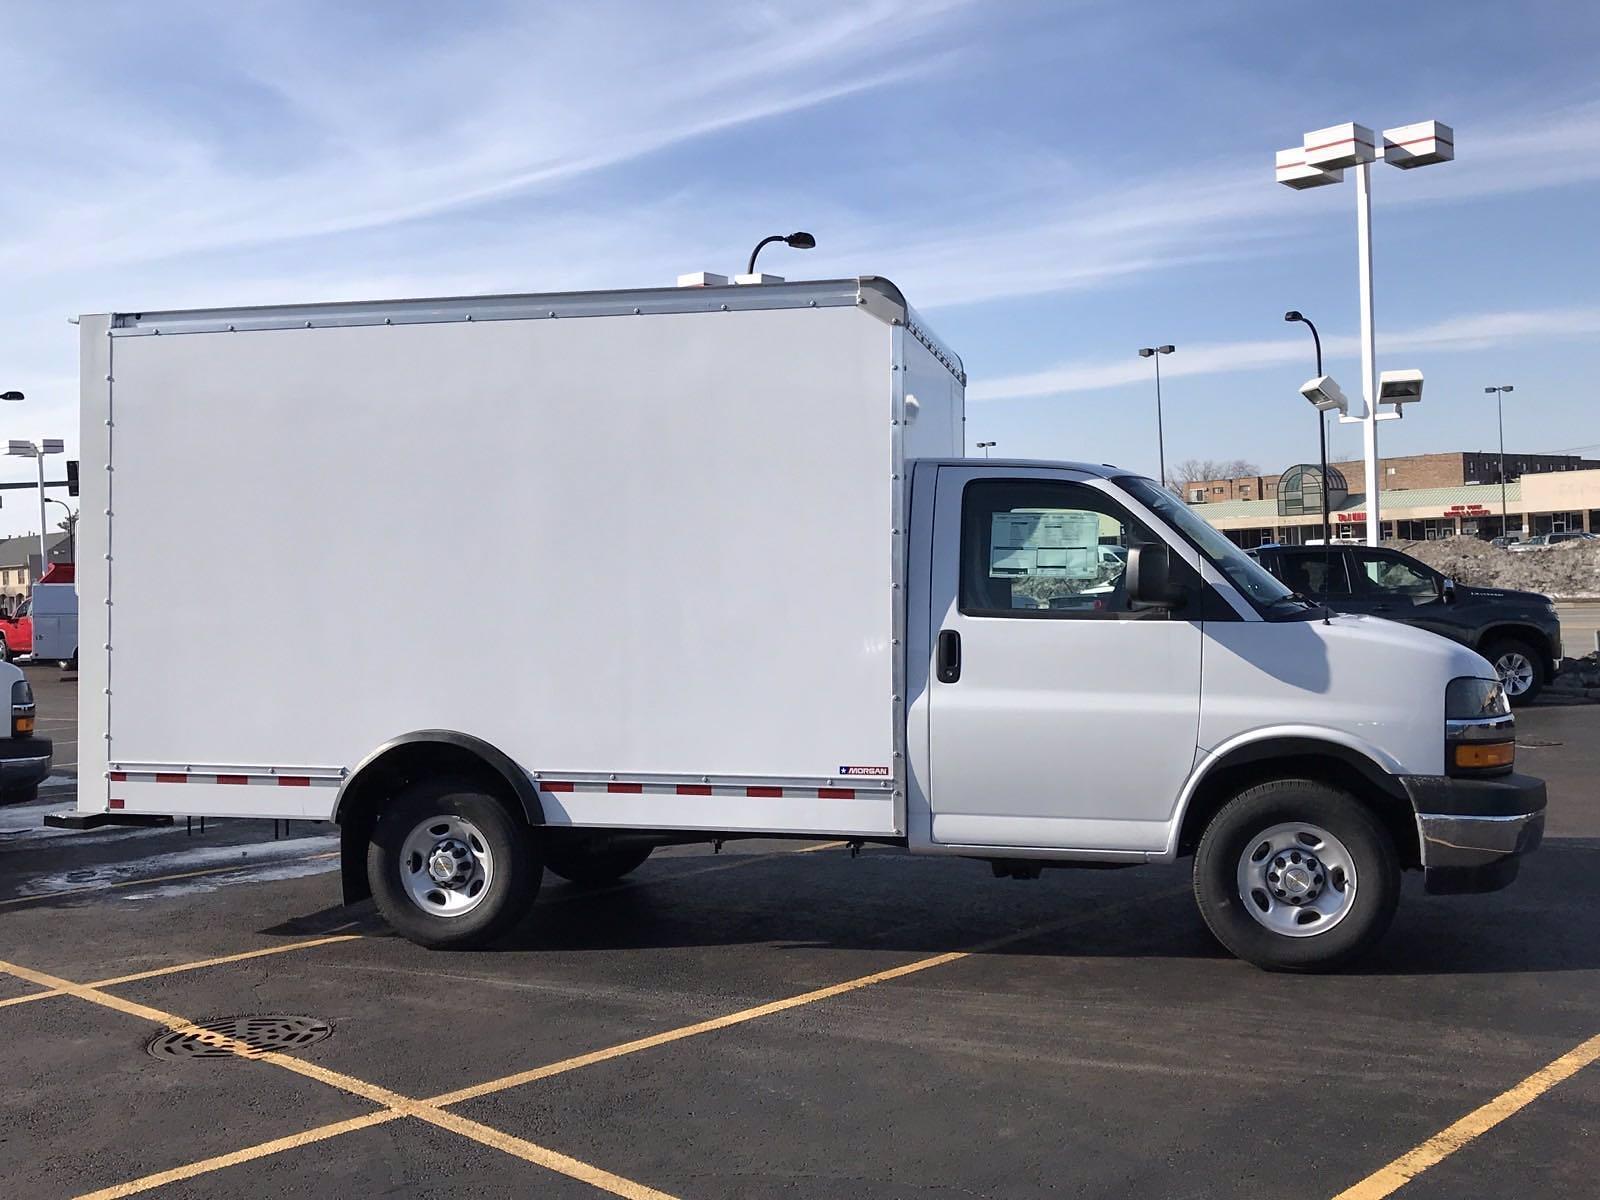 2021 Chevrolet Express 3500 4x2, Cutaway #B27920 - photo 1